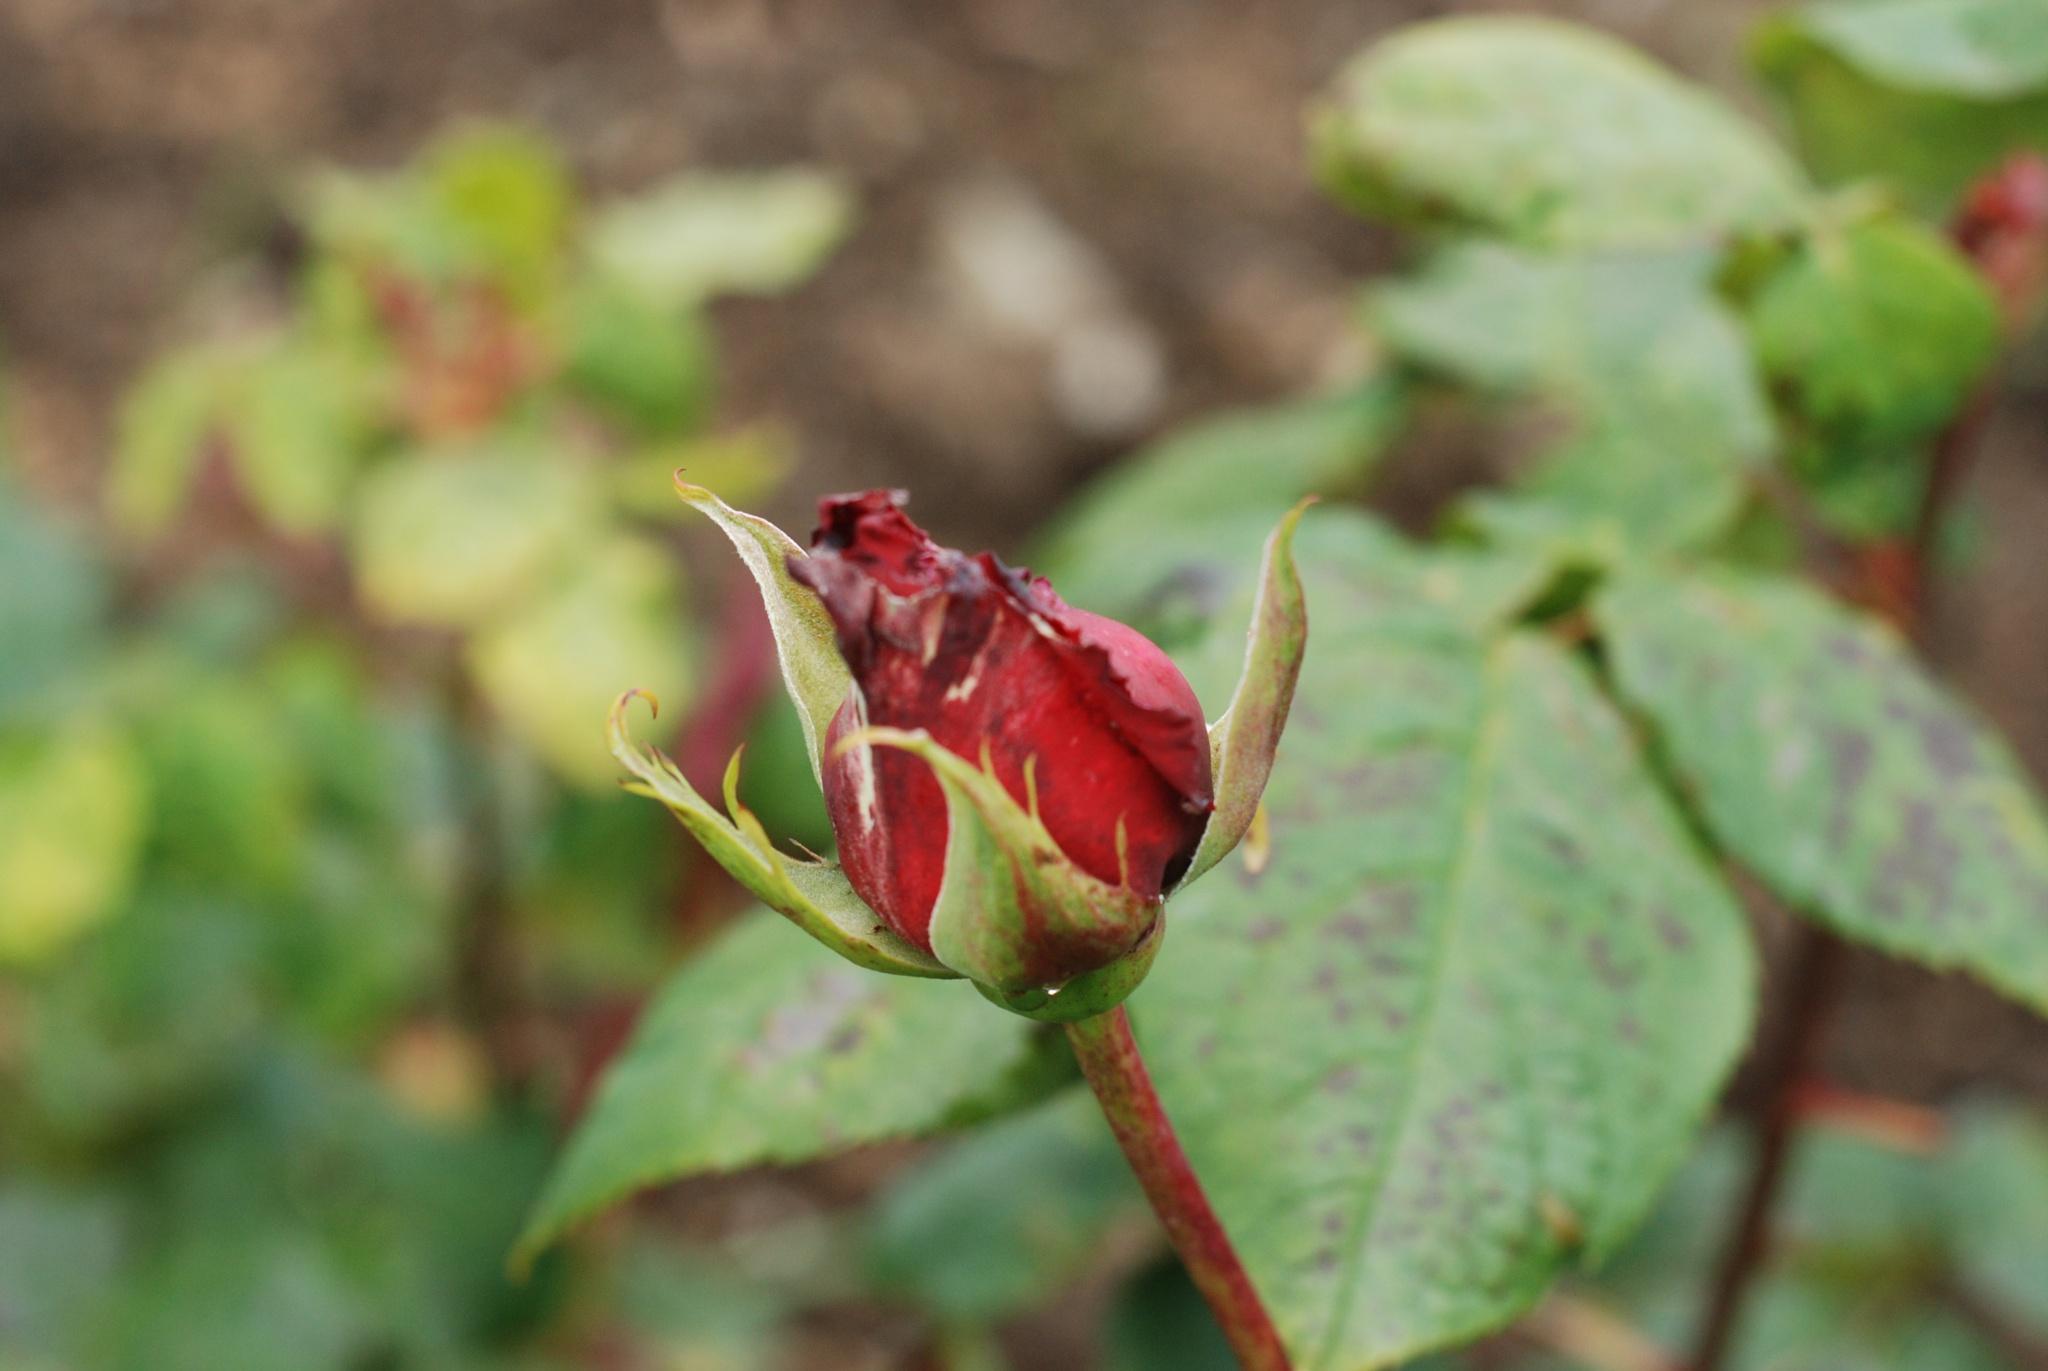 Budding Flower by RichardMoloney